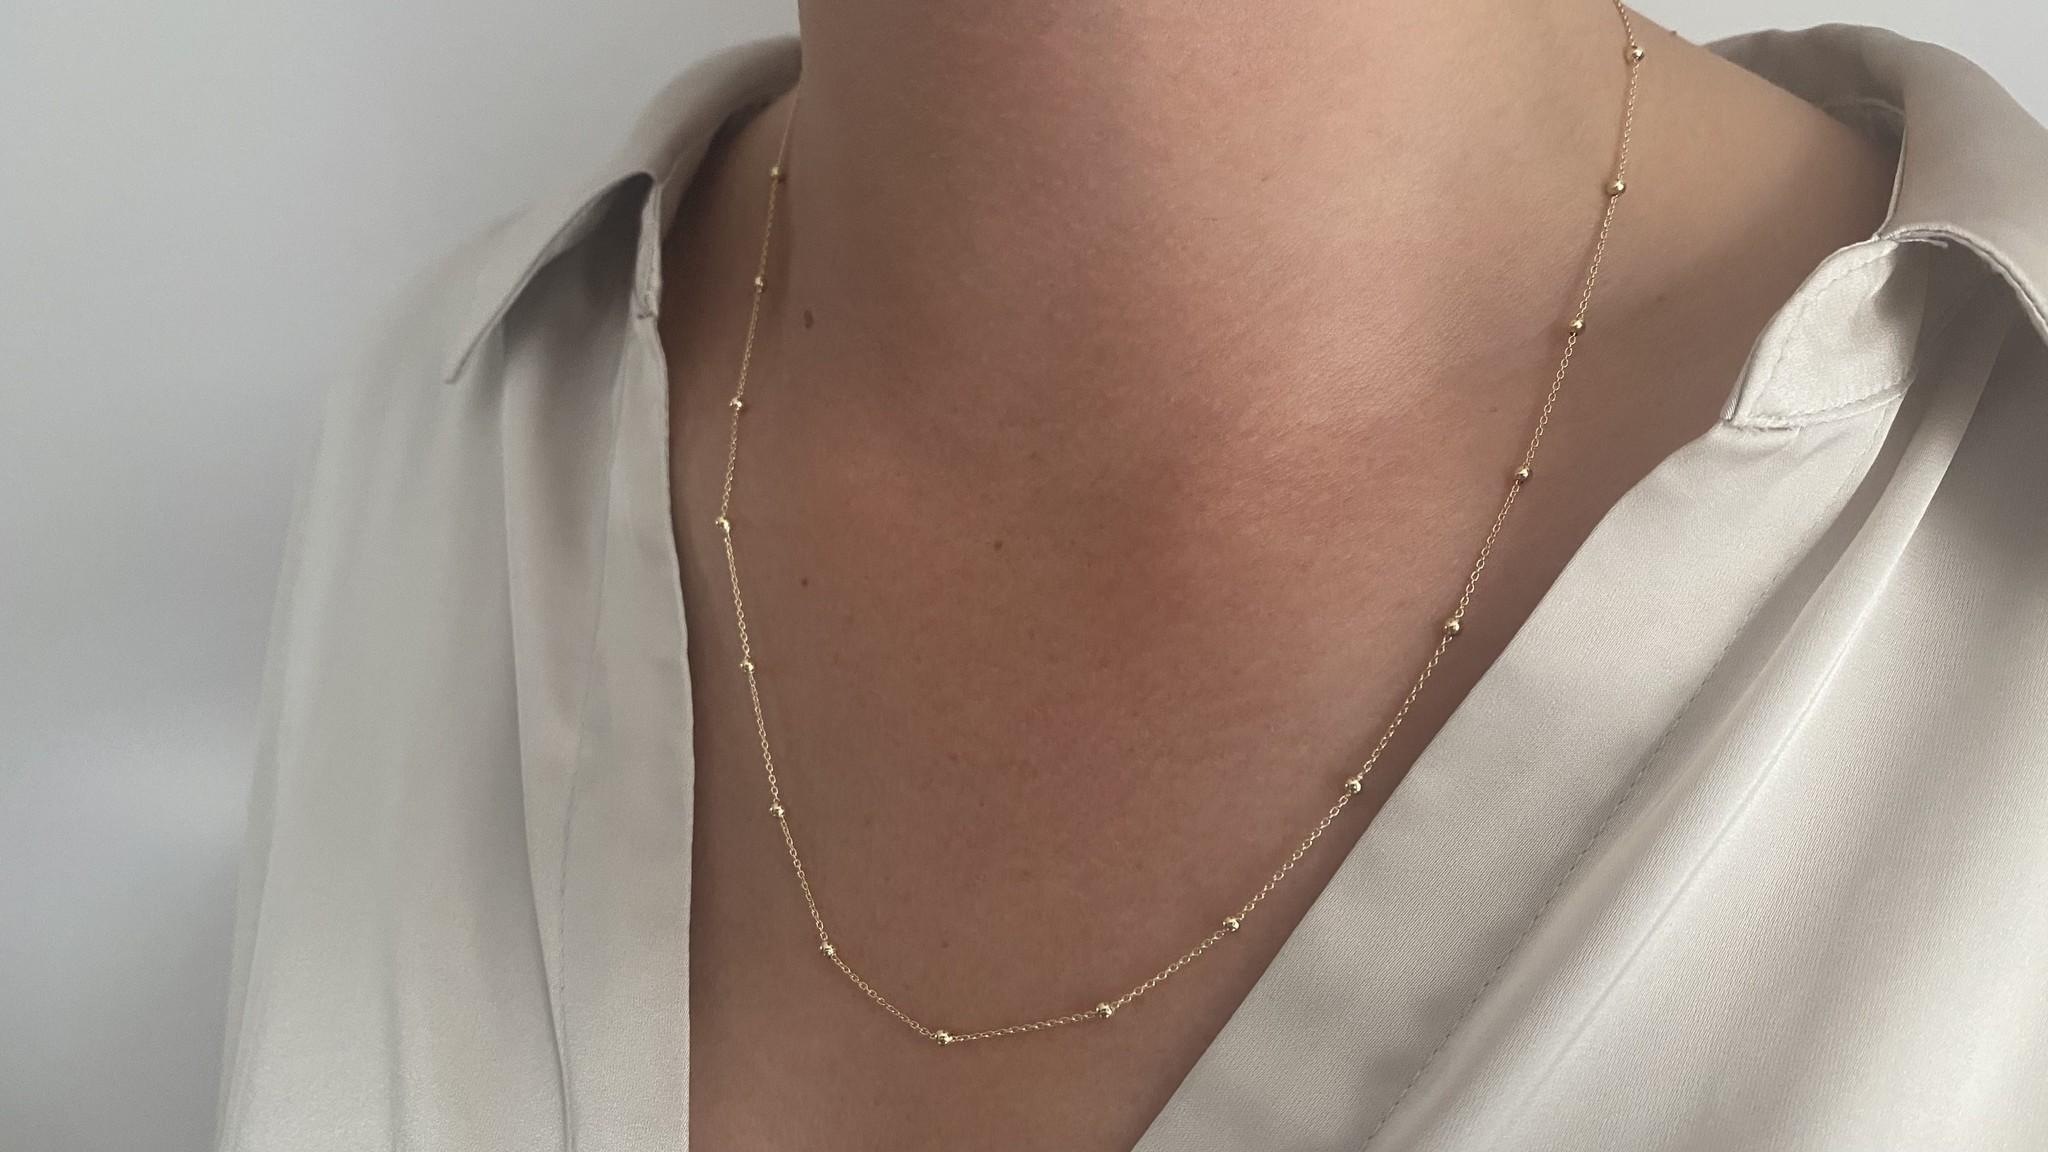 Ketting subtiele chain met balletjes-5